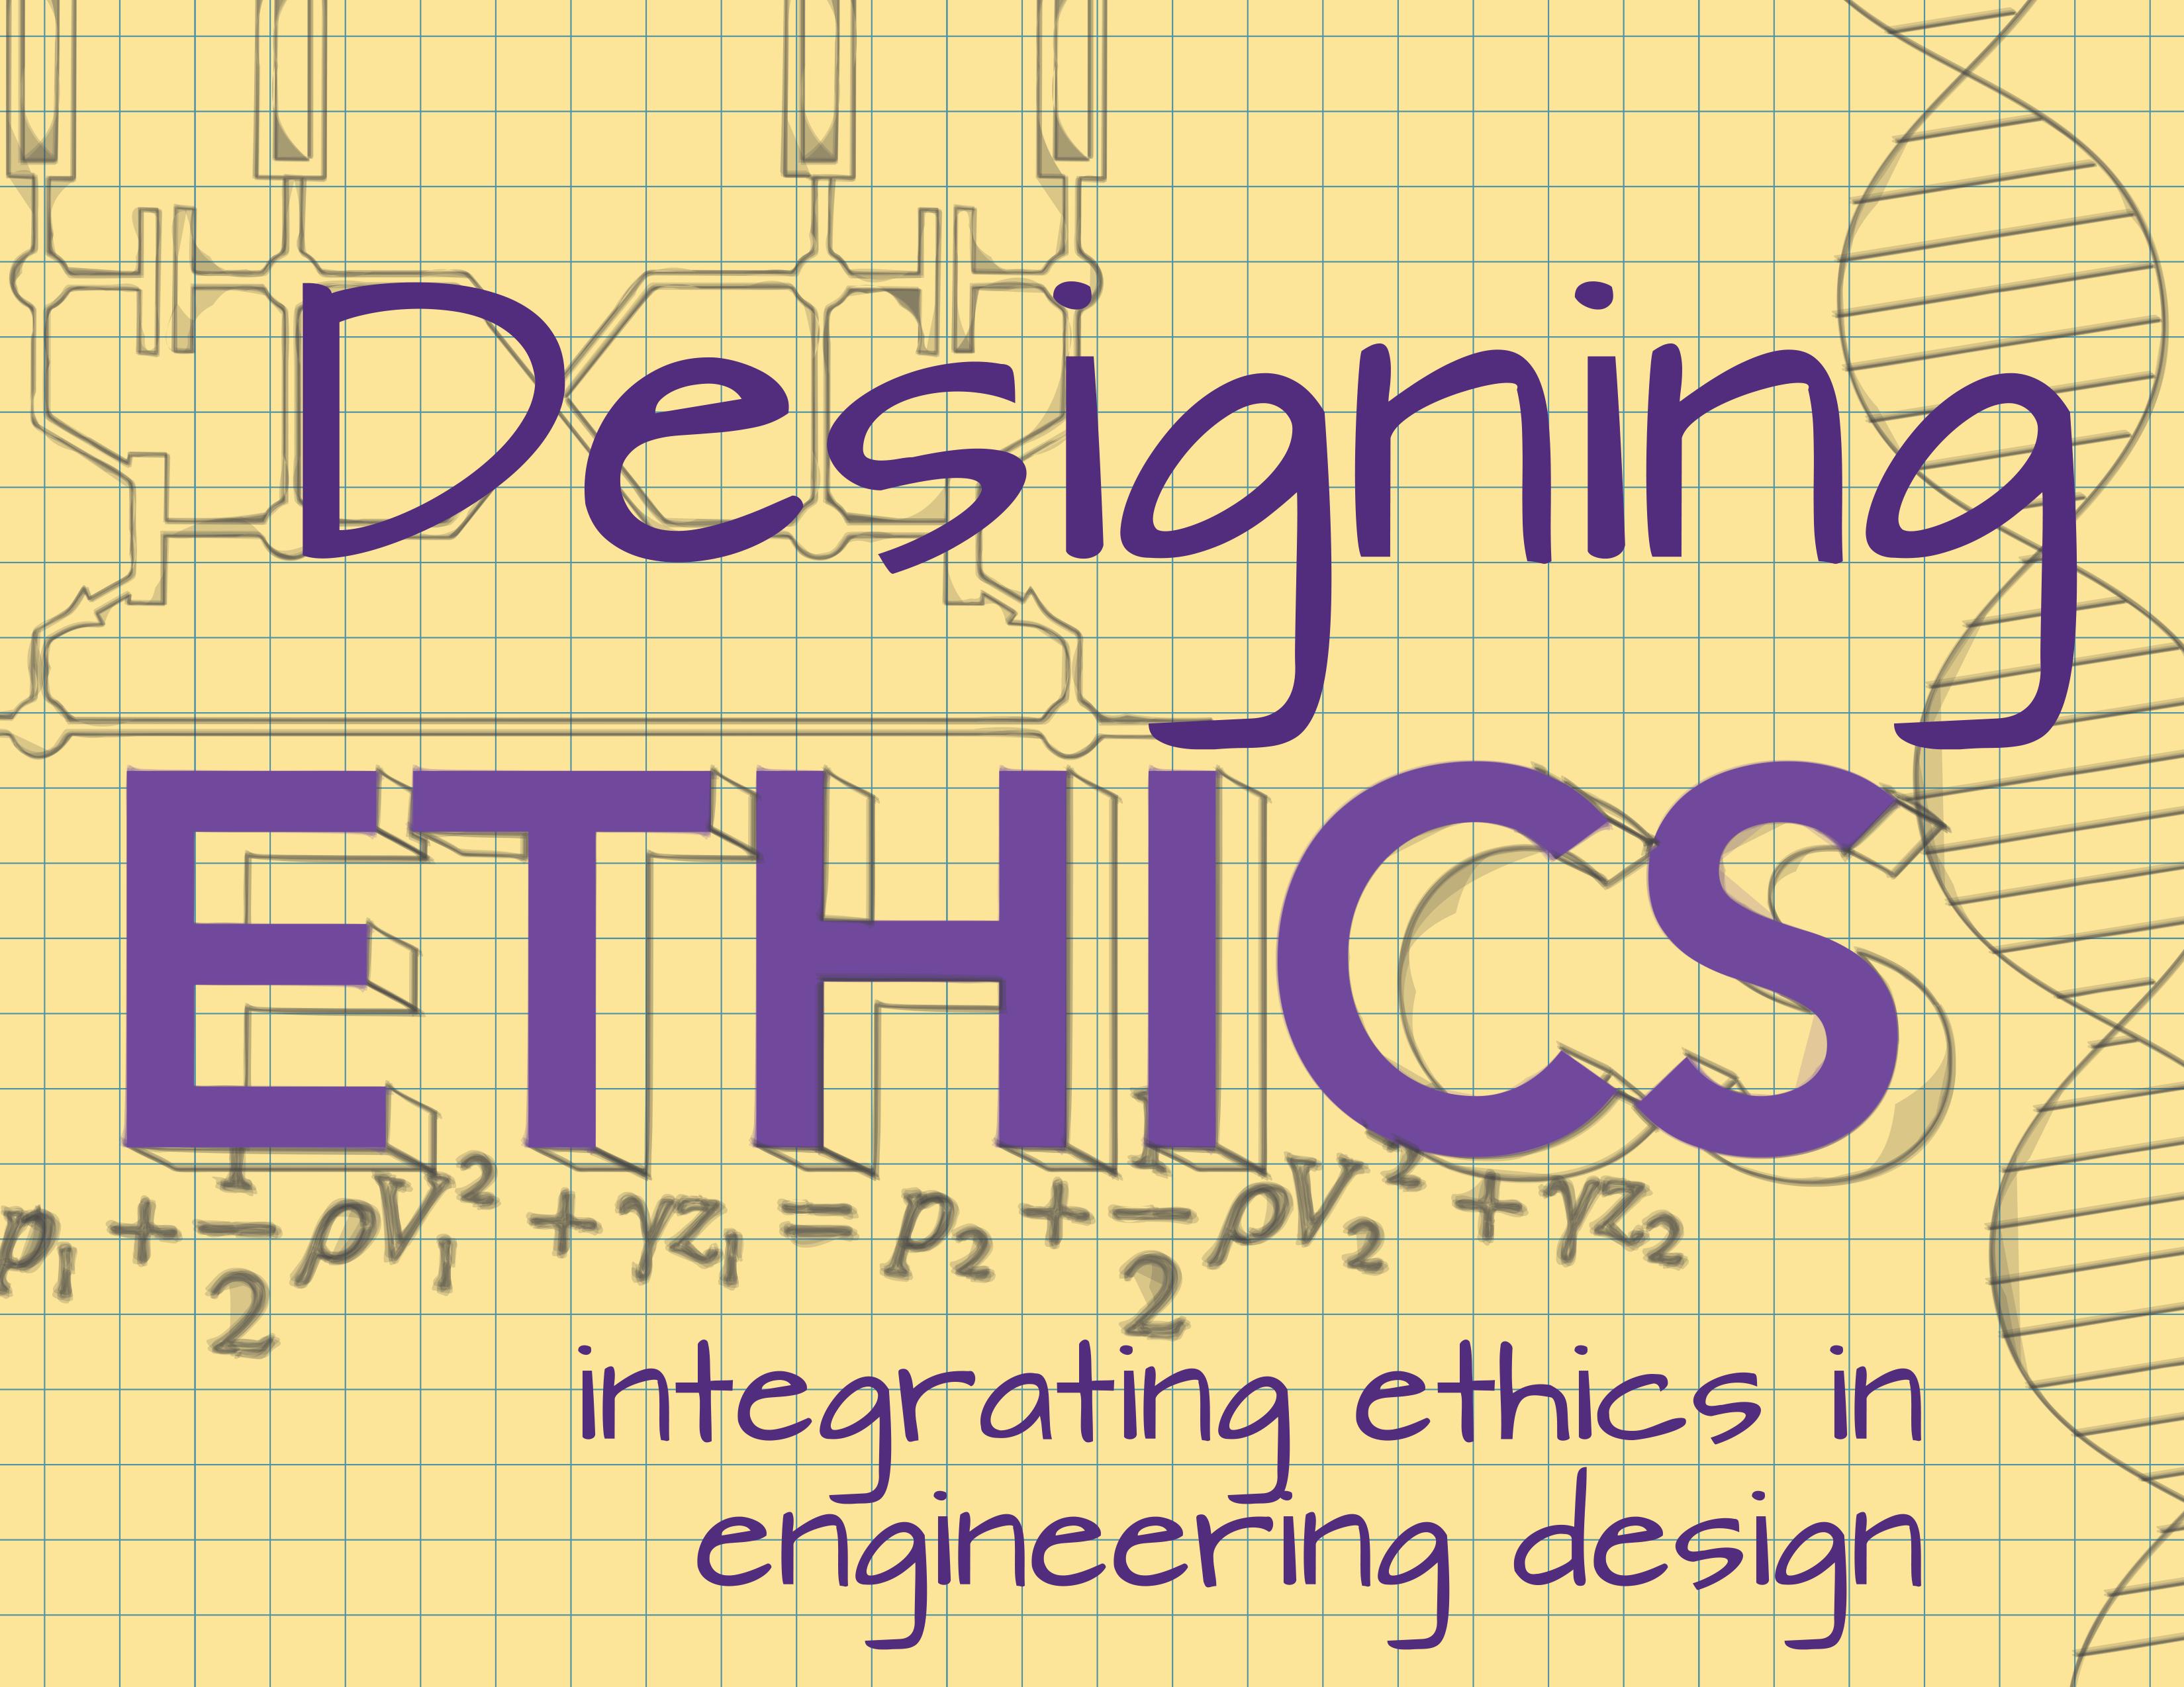 Designing Ethics to Improve Lives